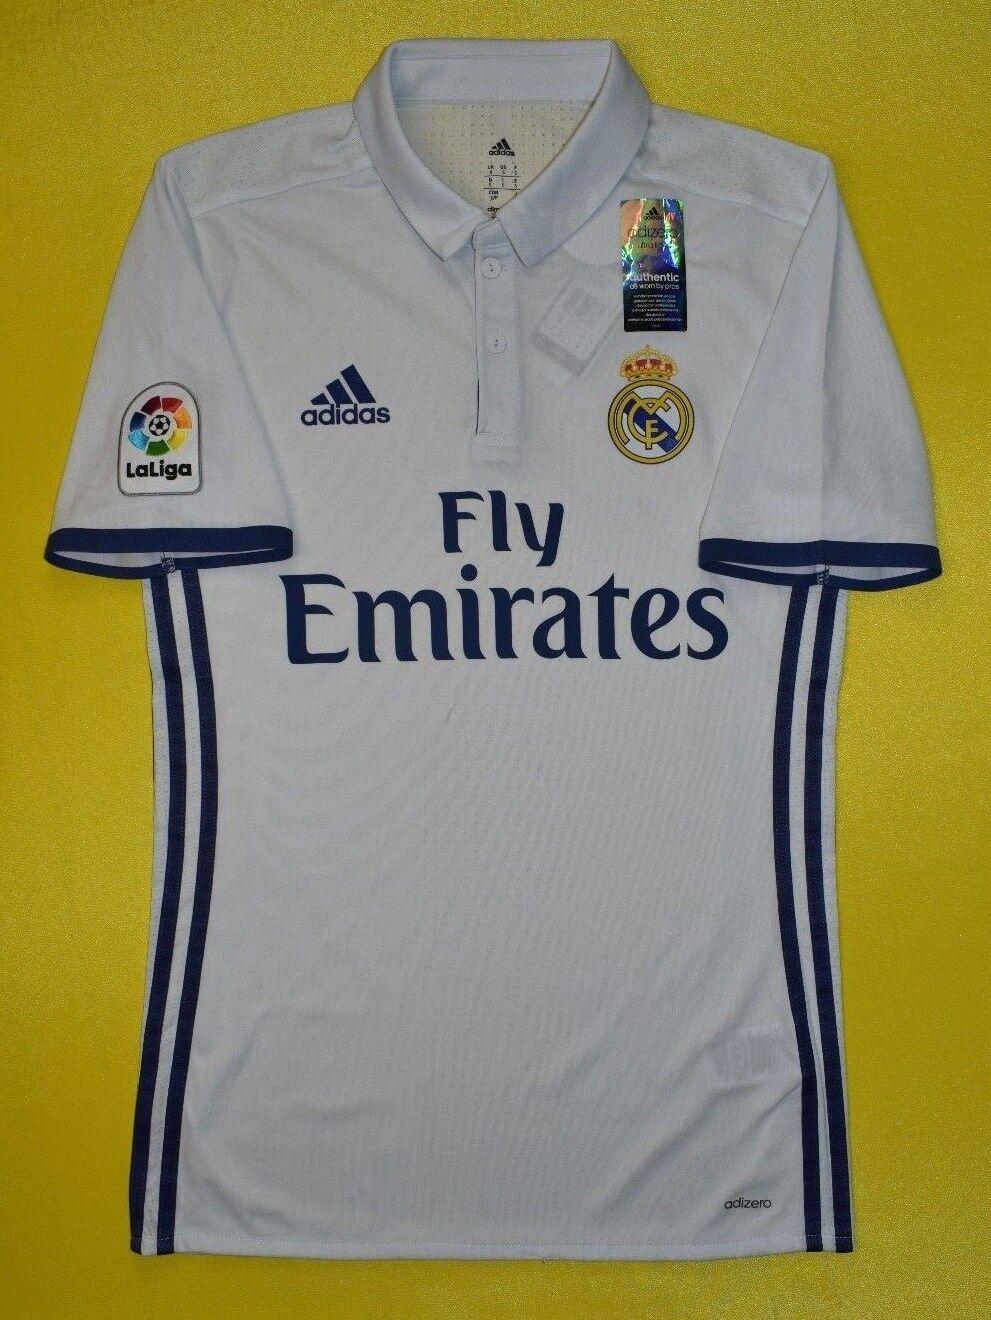 f41736d7dc8 4.8 5 REAL MADRID 20162017 FOOTBALL JERSEY SHIRT ADIZERO PLAYER ISSUE ADIDAS